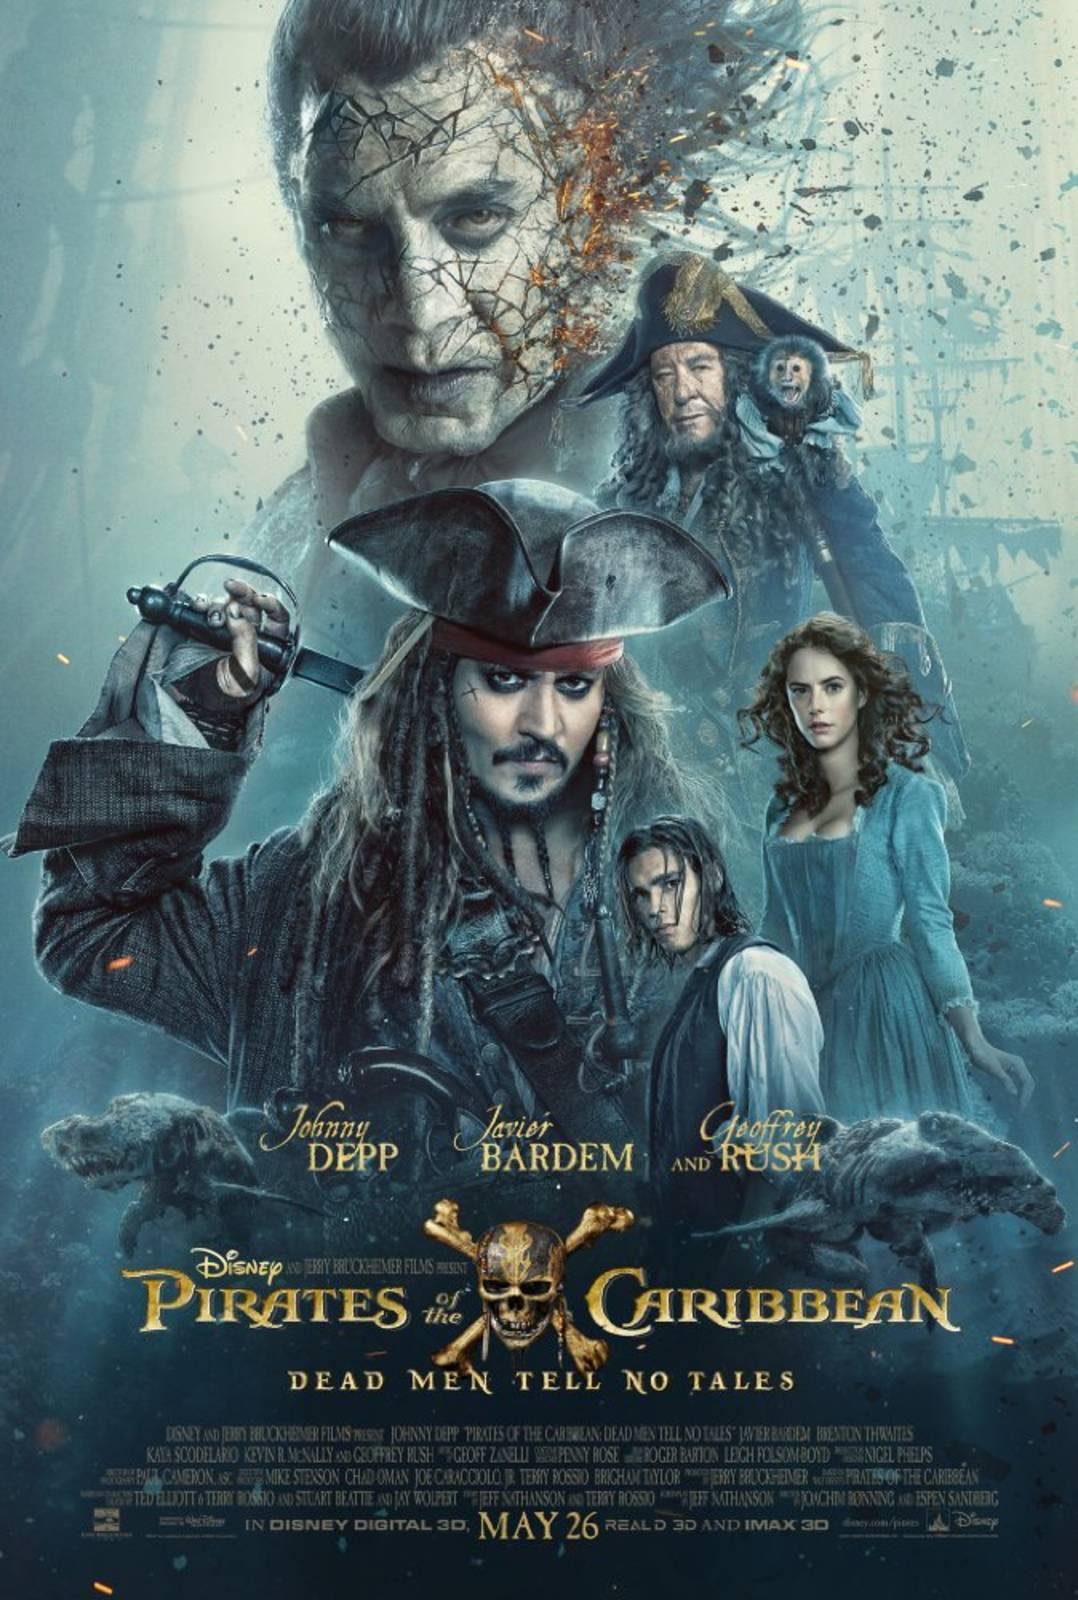 Pirates Of The Caribbean: Salazar's Revenge film review